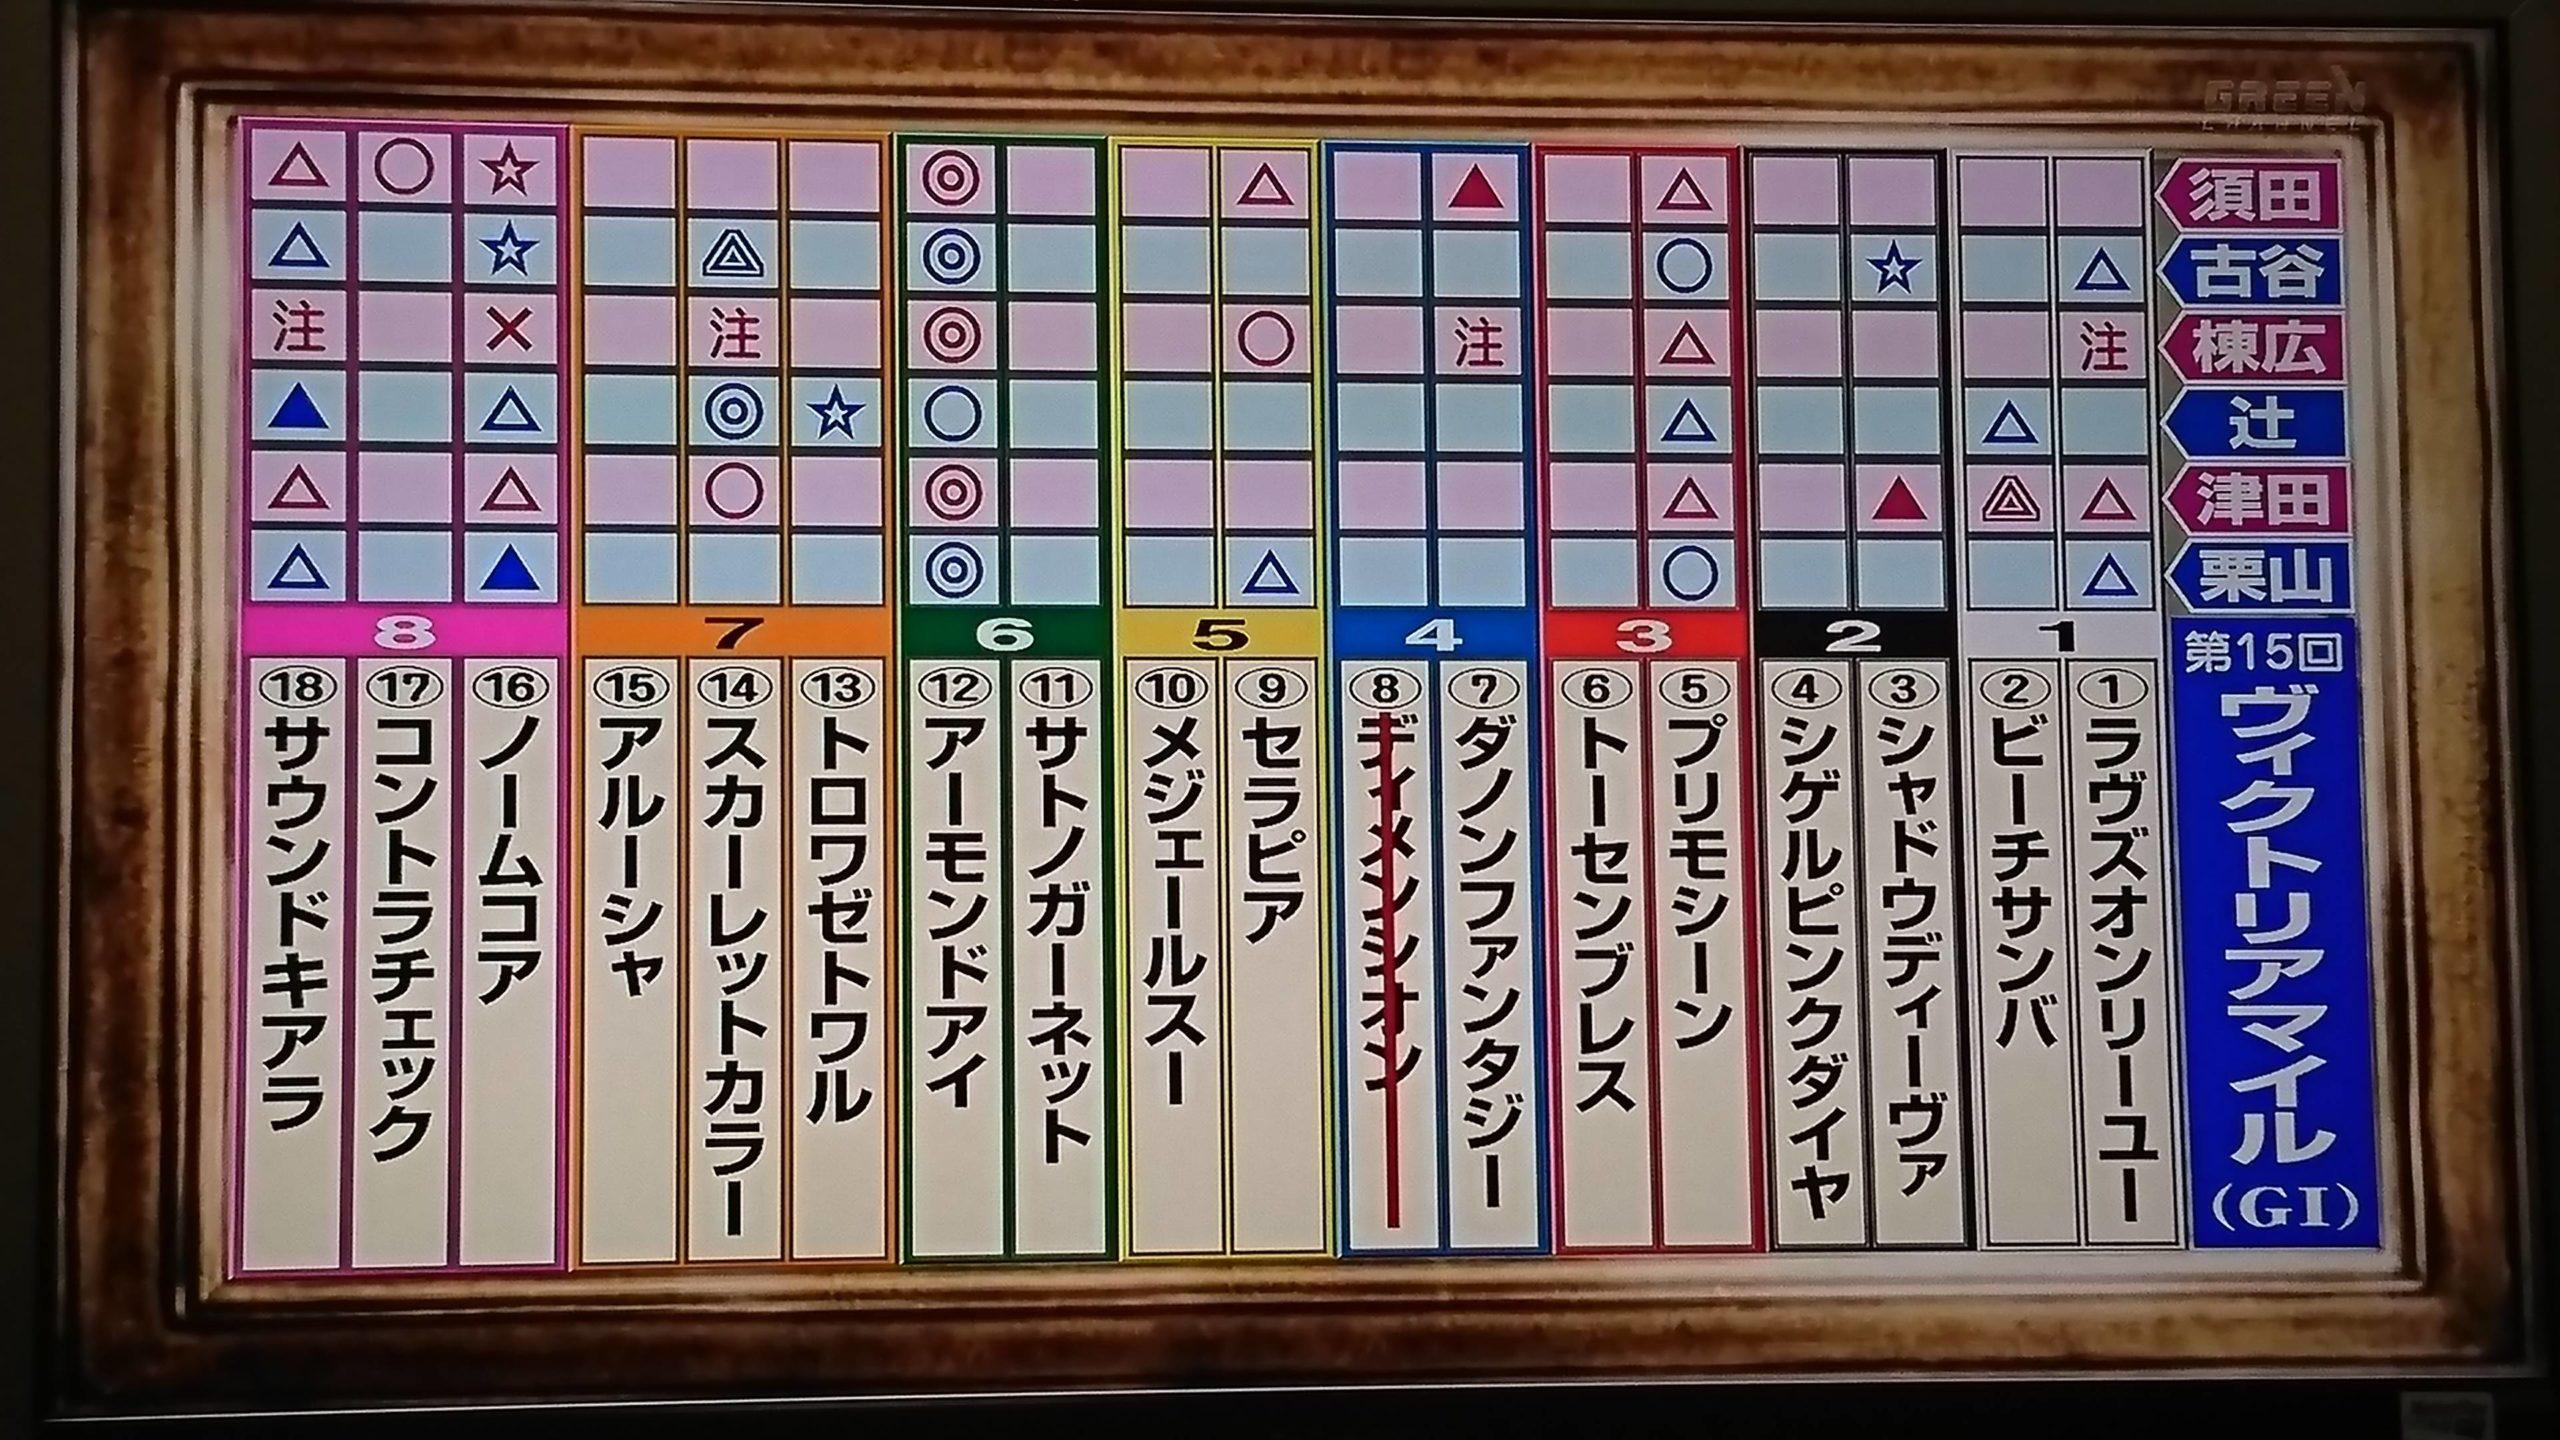 mnewsplus 1589698337 2901 scaled - ヴィクトリアマイル(東京・G1) これが現役最強馬!好位追走アーモンドアイ(ルメール)ほとんど追わずに圧勝!G1・7勝目